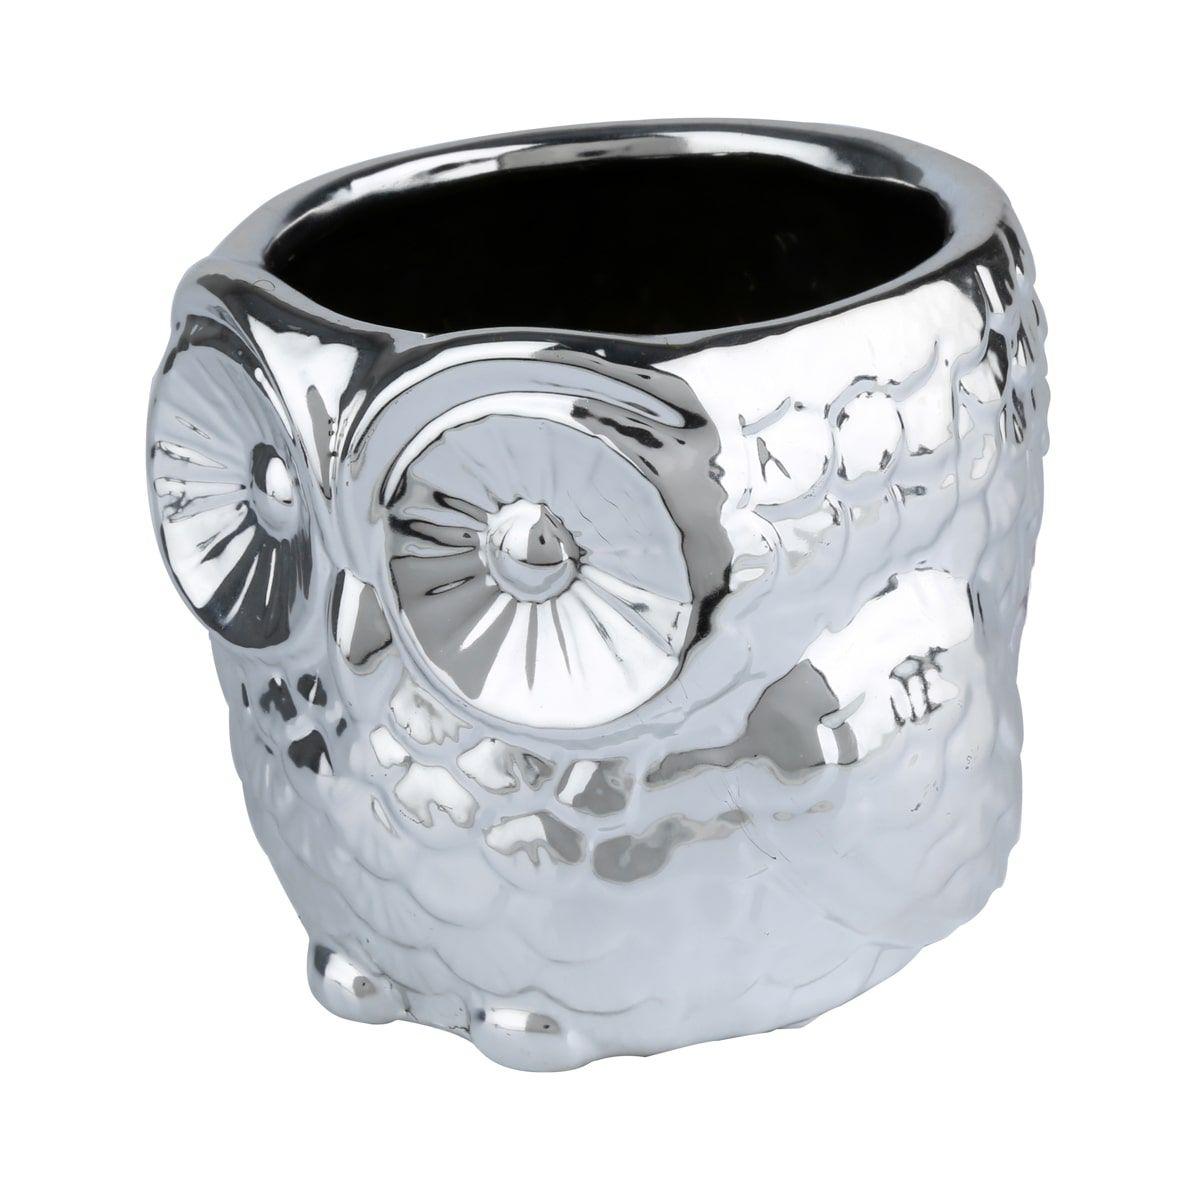 Cachepot Coruja em Cerâmica Prata